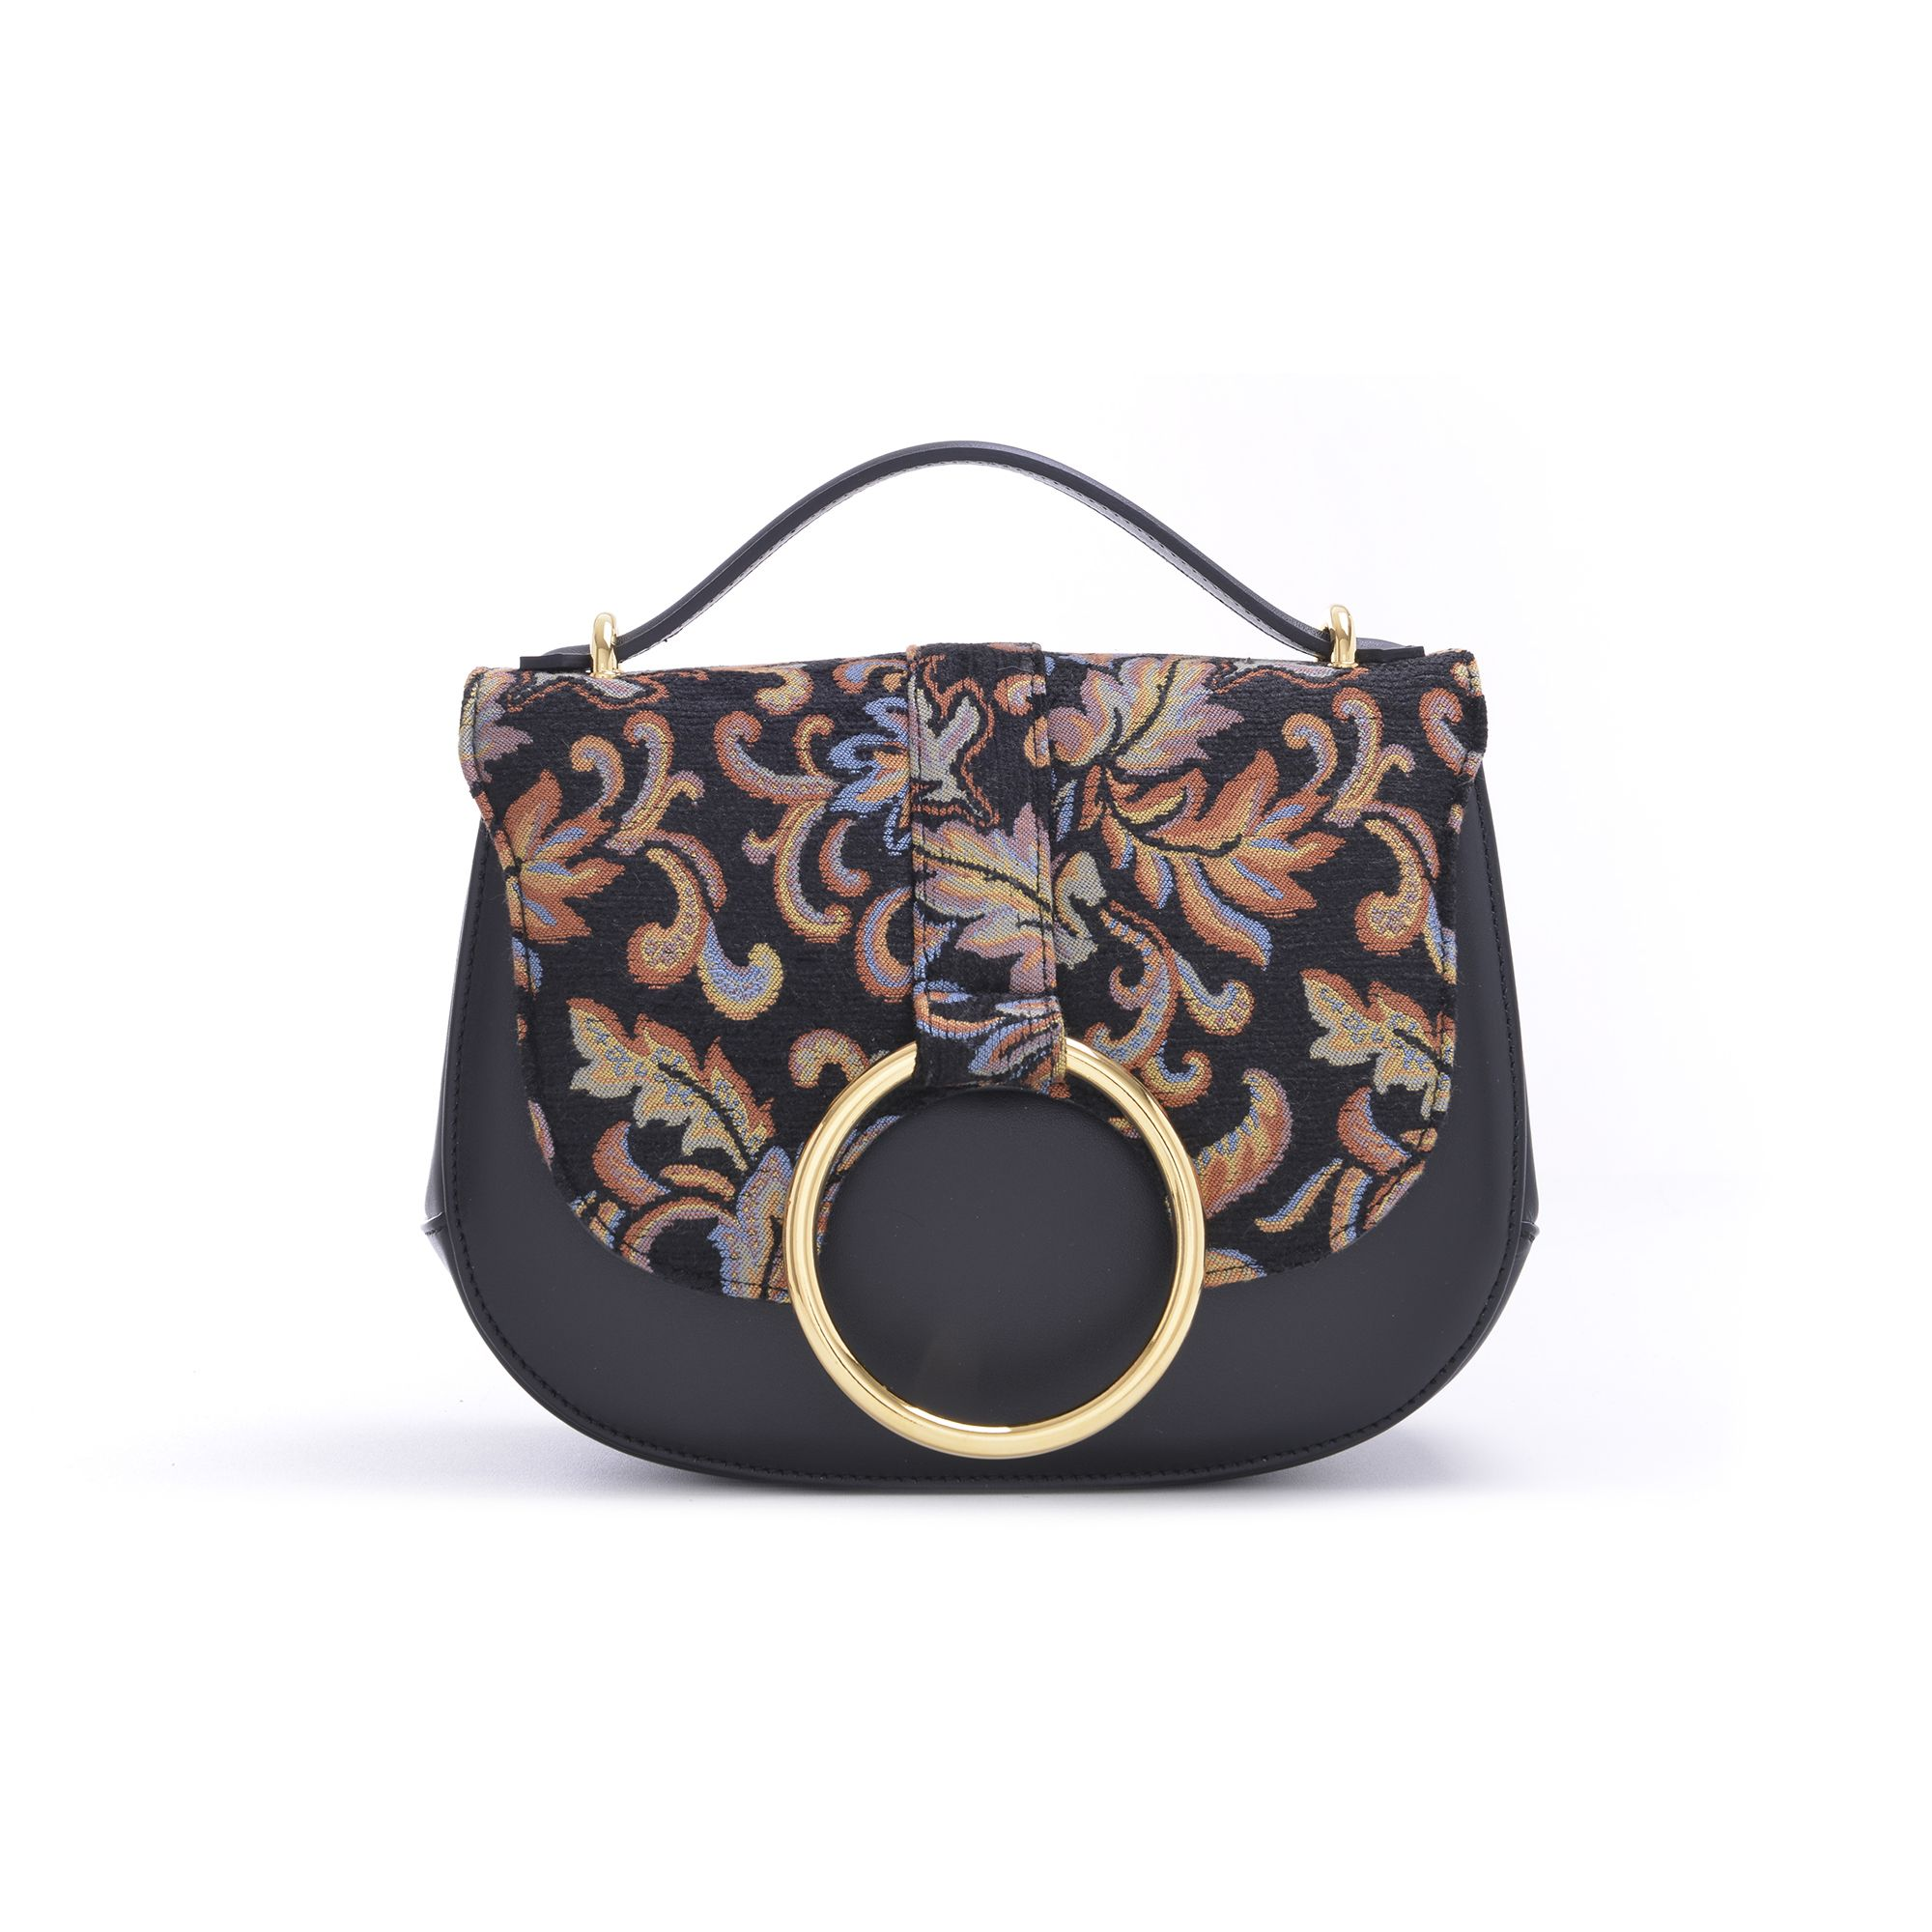 Carbotti 310 - Woman Leather Handbag calfskin black / jac. Flowers - http://carbotti.it/en/product/carbotti-310-woman-leather-handbag-calfskin-black-jac-flowers/